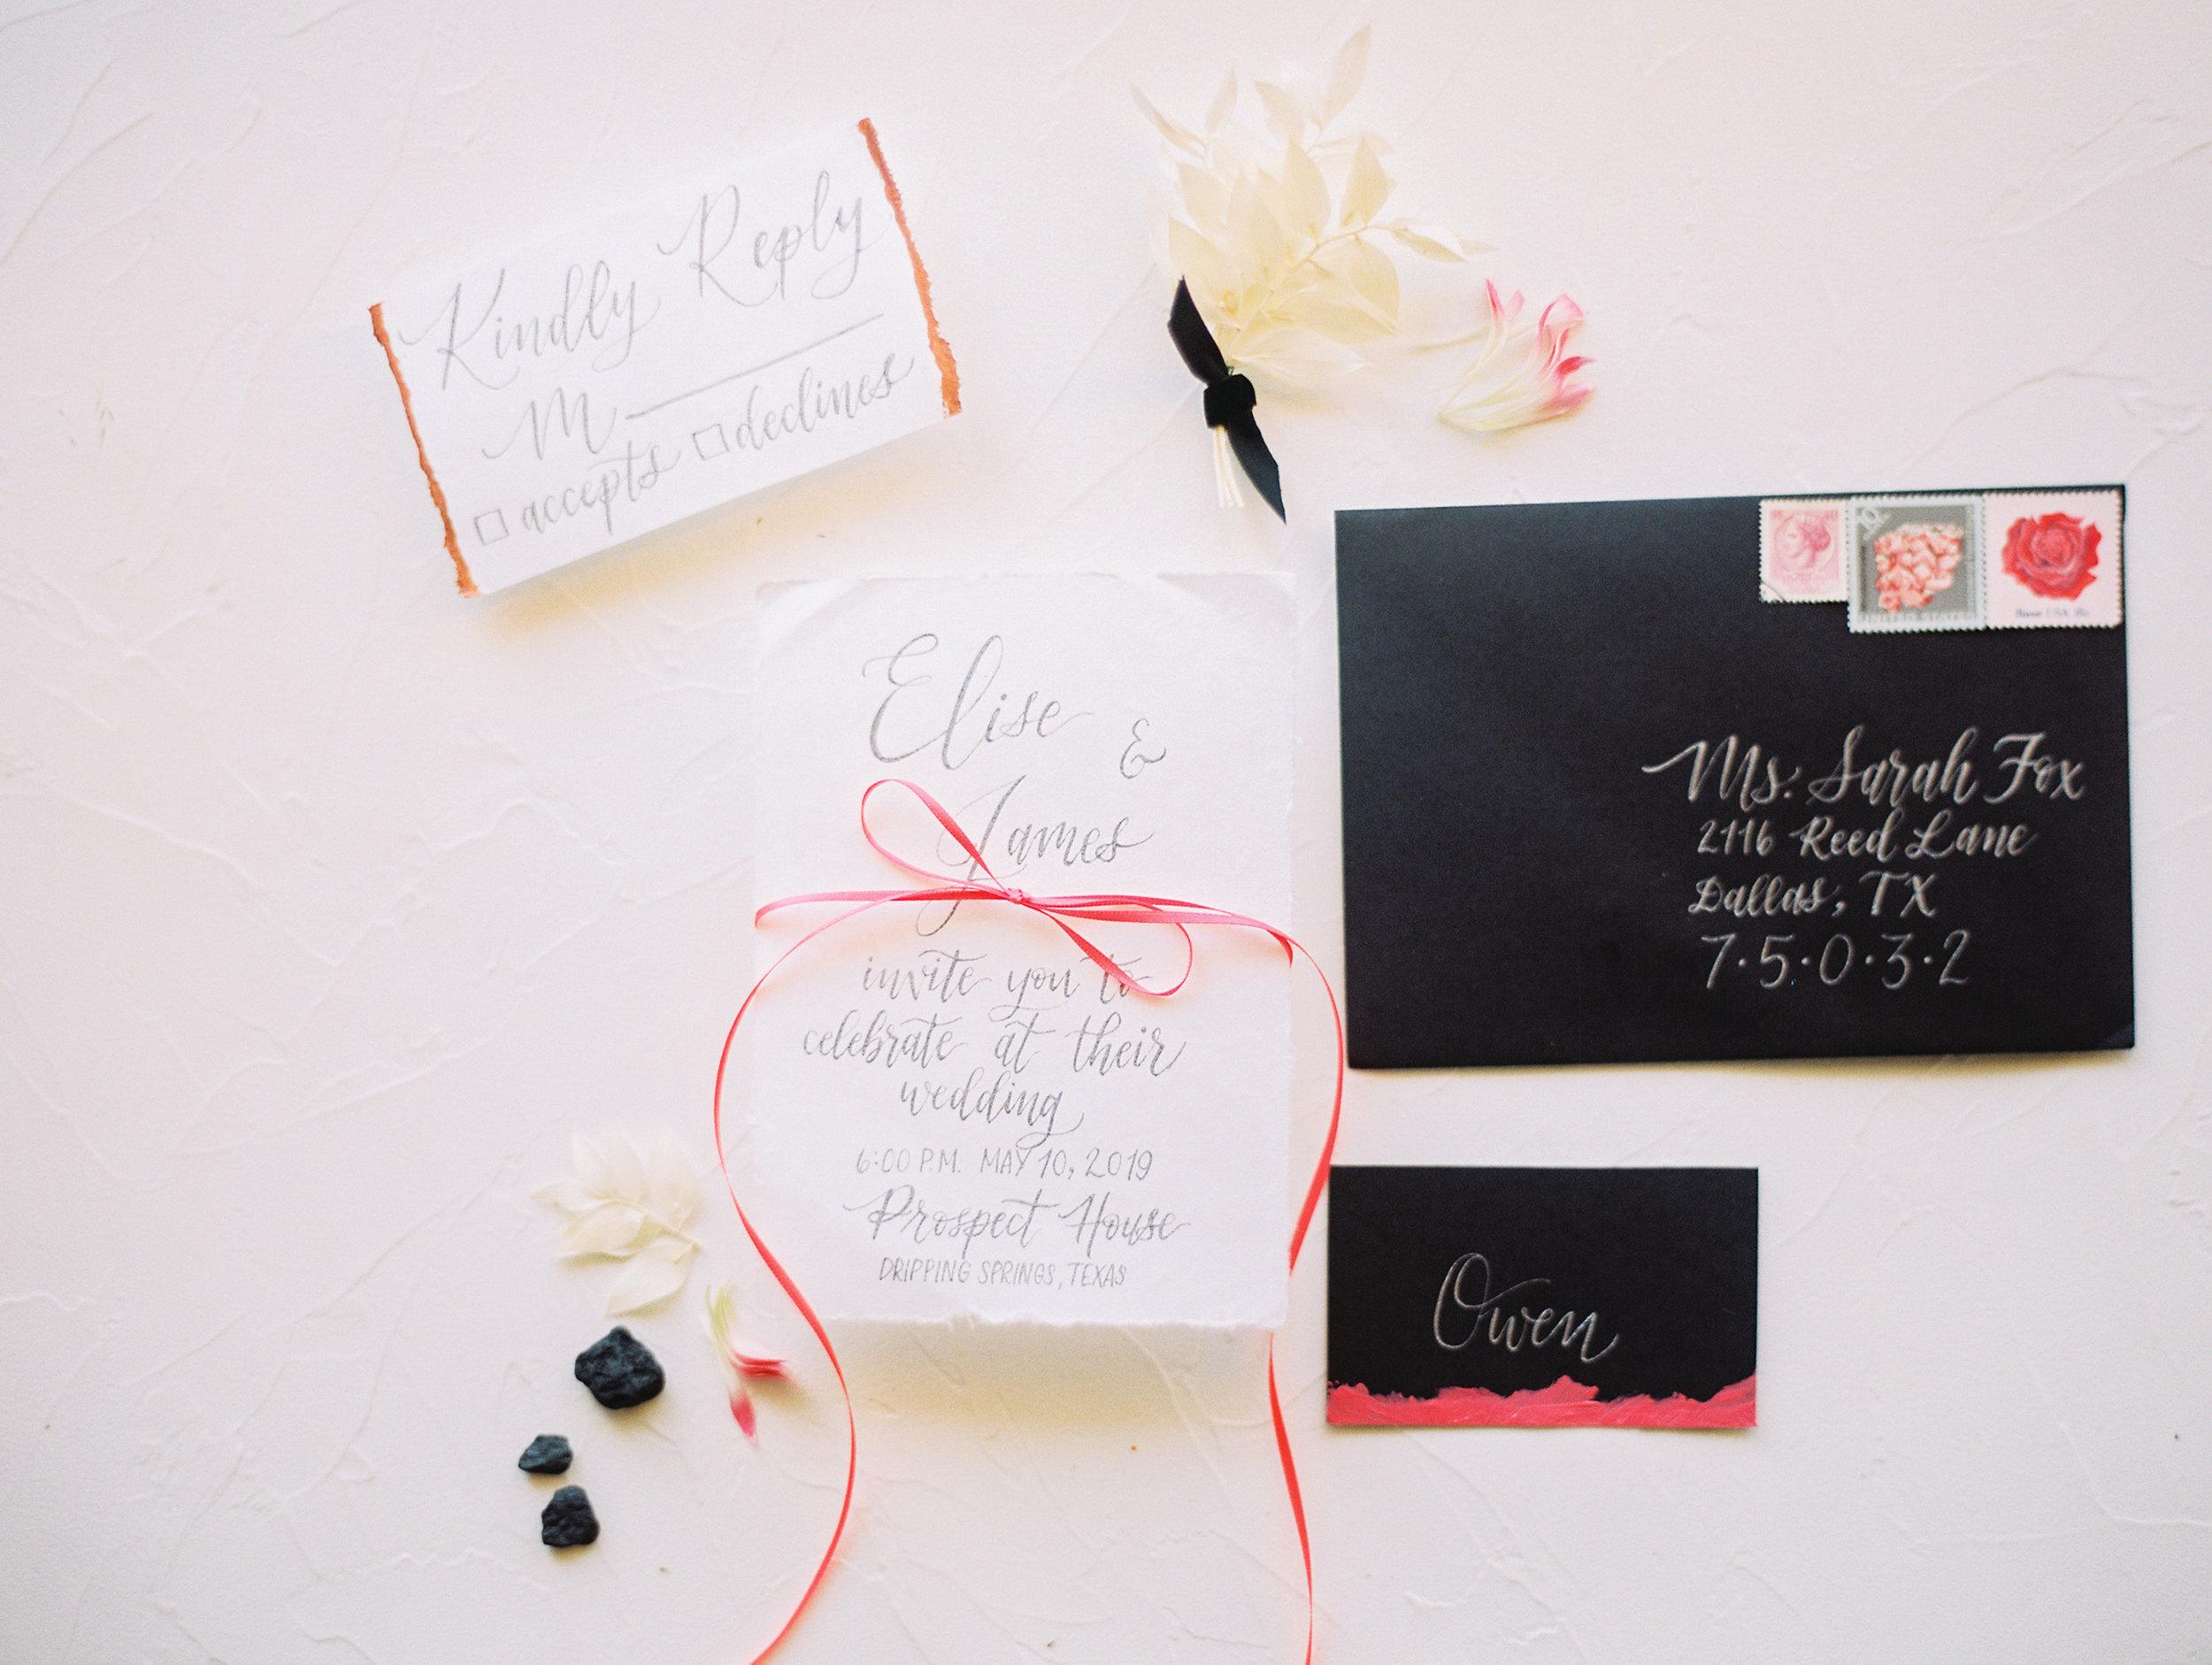 Kristin-La-Voie-Photography-Austin-Wedding-Photographer-Prospect-House-149.jpg